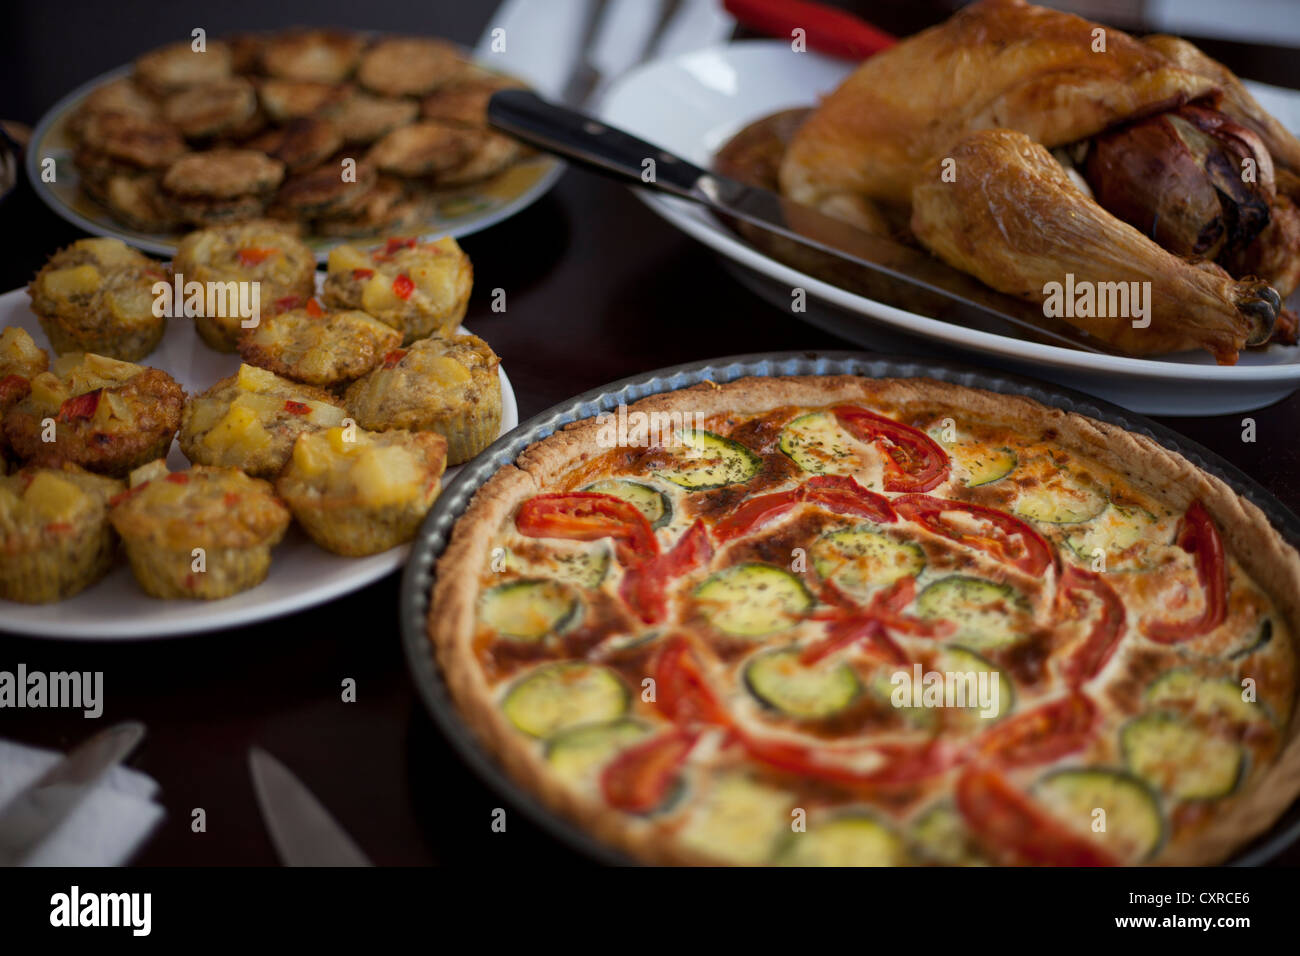 Spanish Flan Stockfotos & Spanish Flan Bilder - Alamy